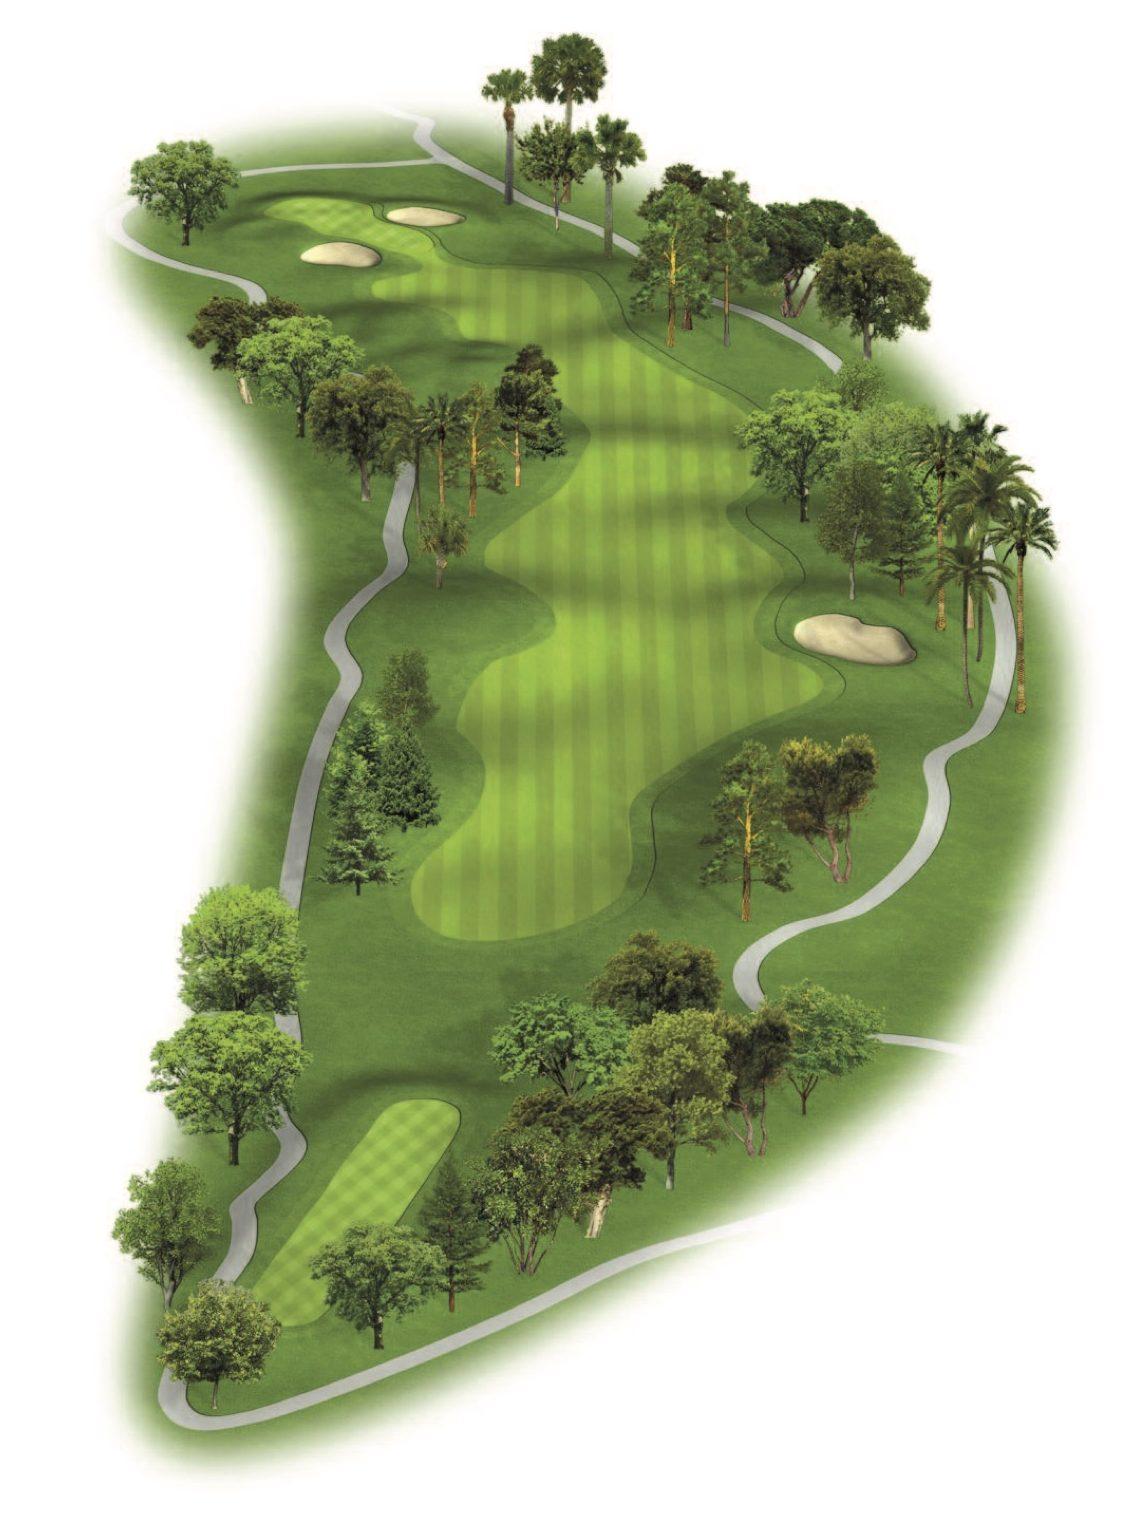 Patriot #10 Wigwam Golf Course Near Phoenix